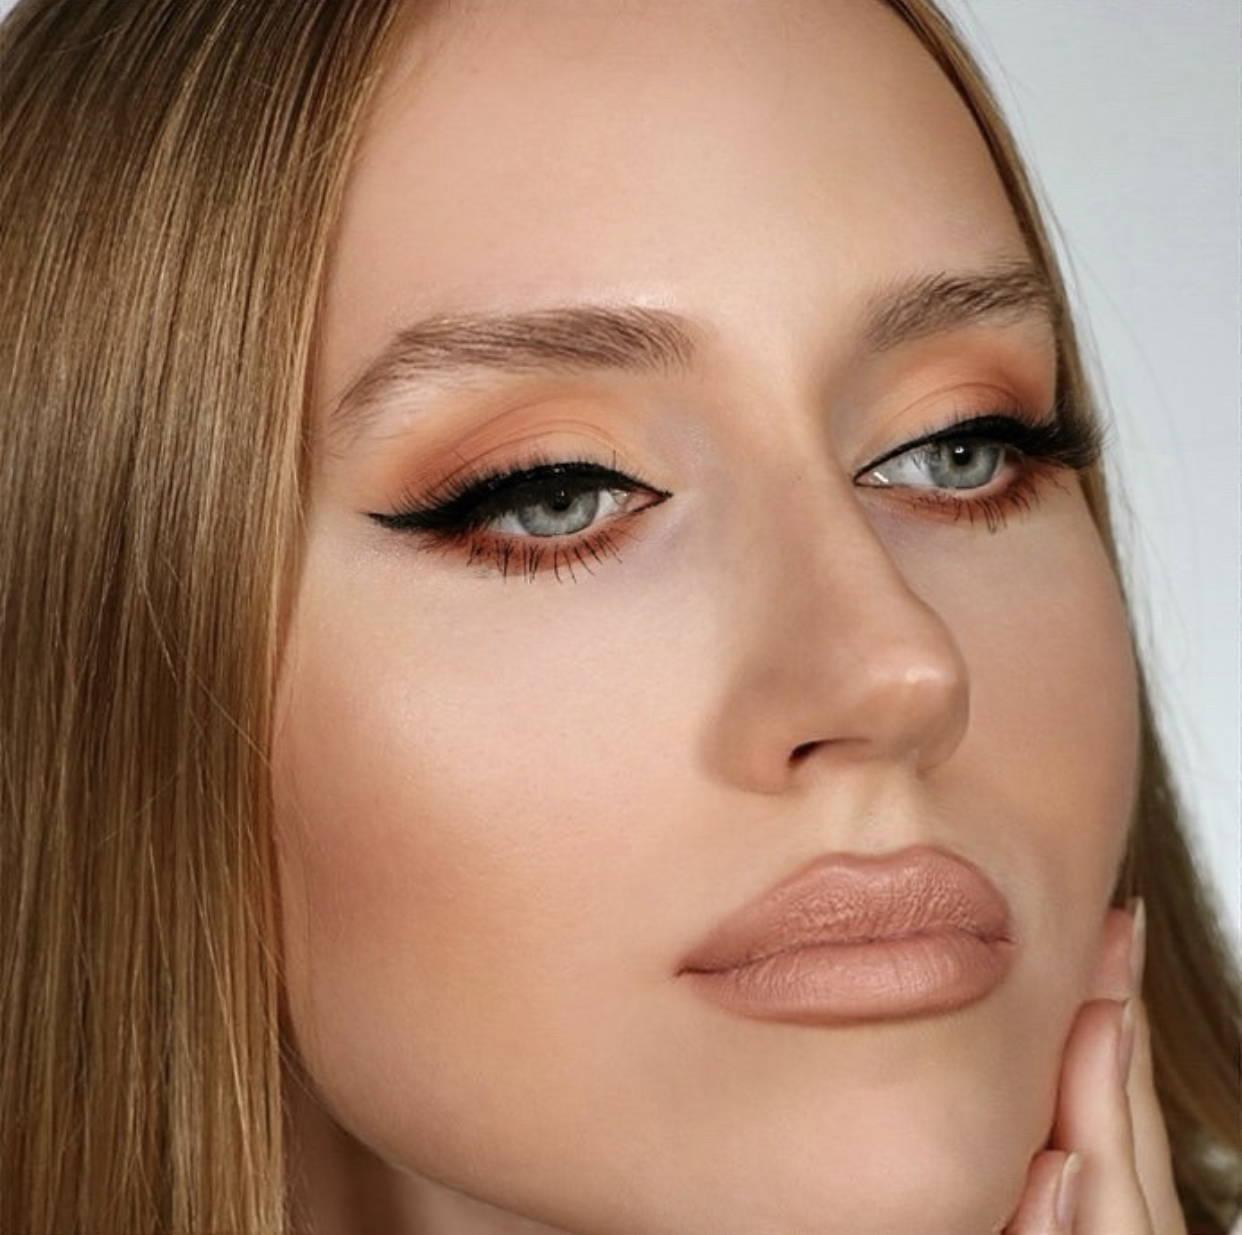 vike twins bali lash black adhesive eyeliner